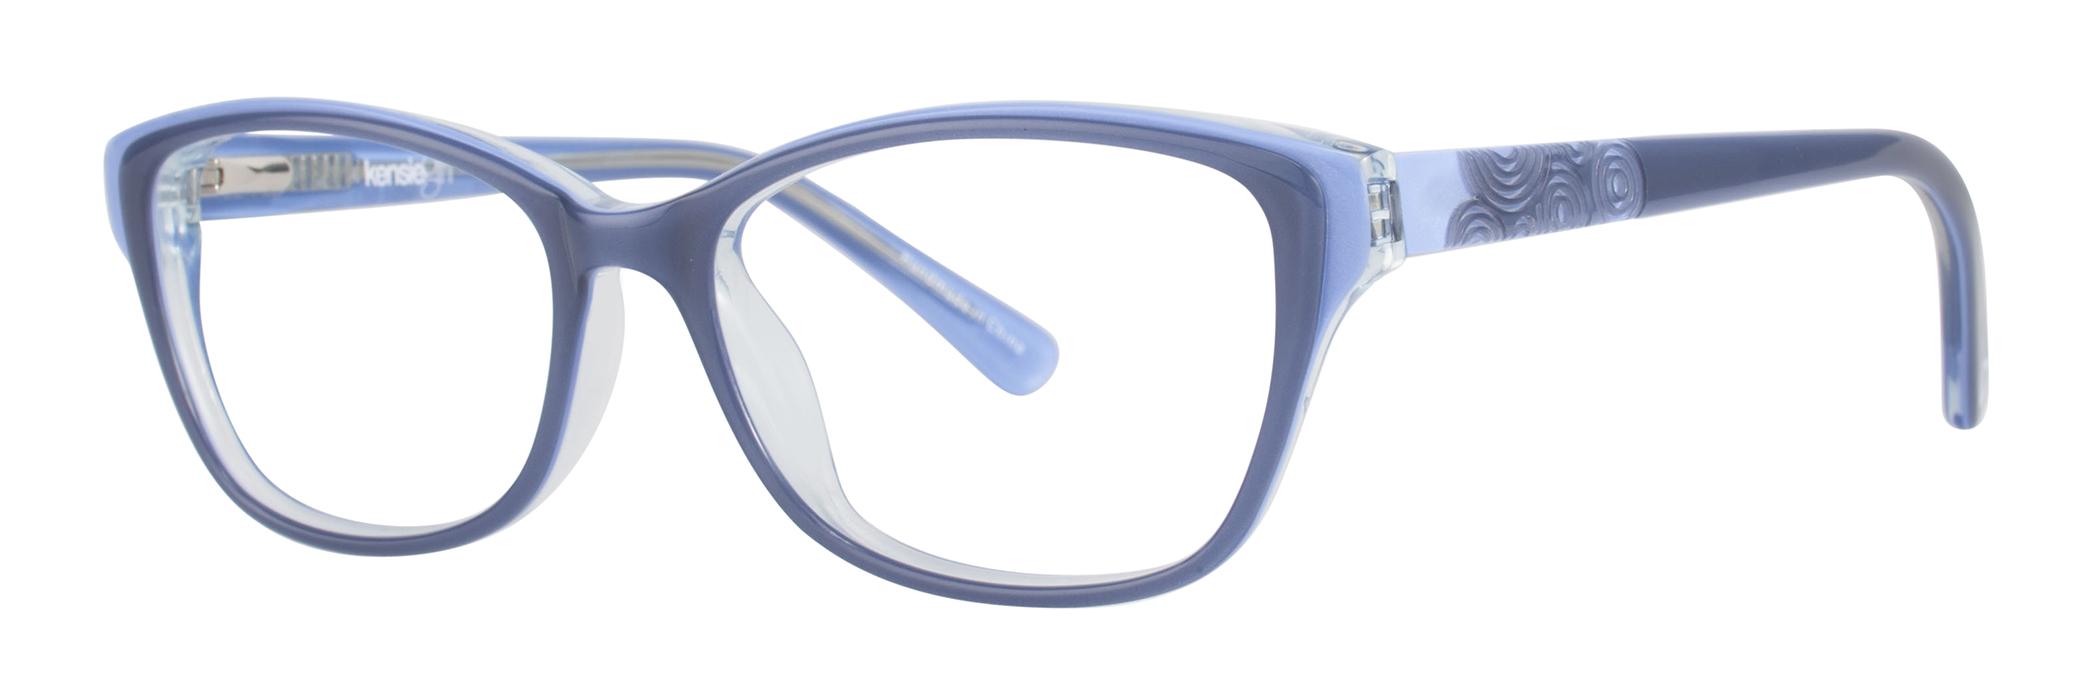 91b346fc6d993 Eyewear for Kids - Blue - Optiwow